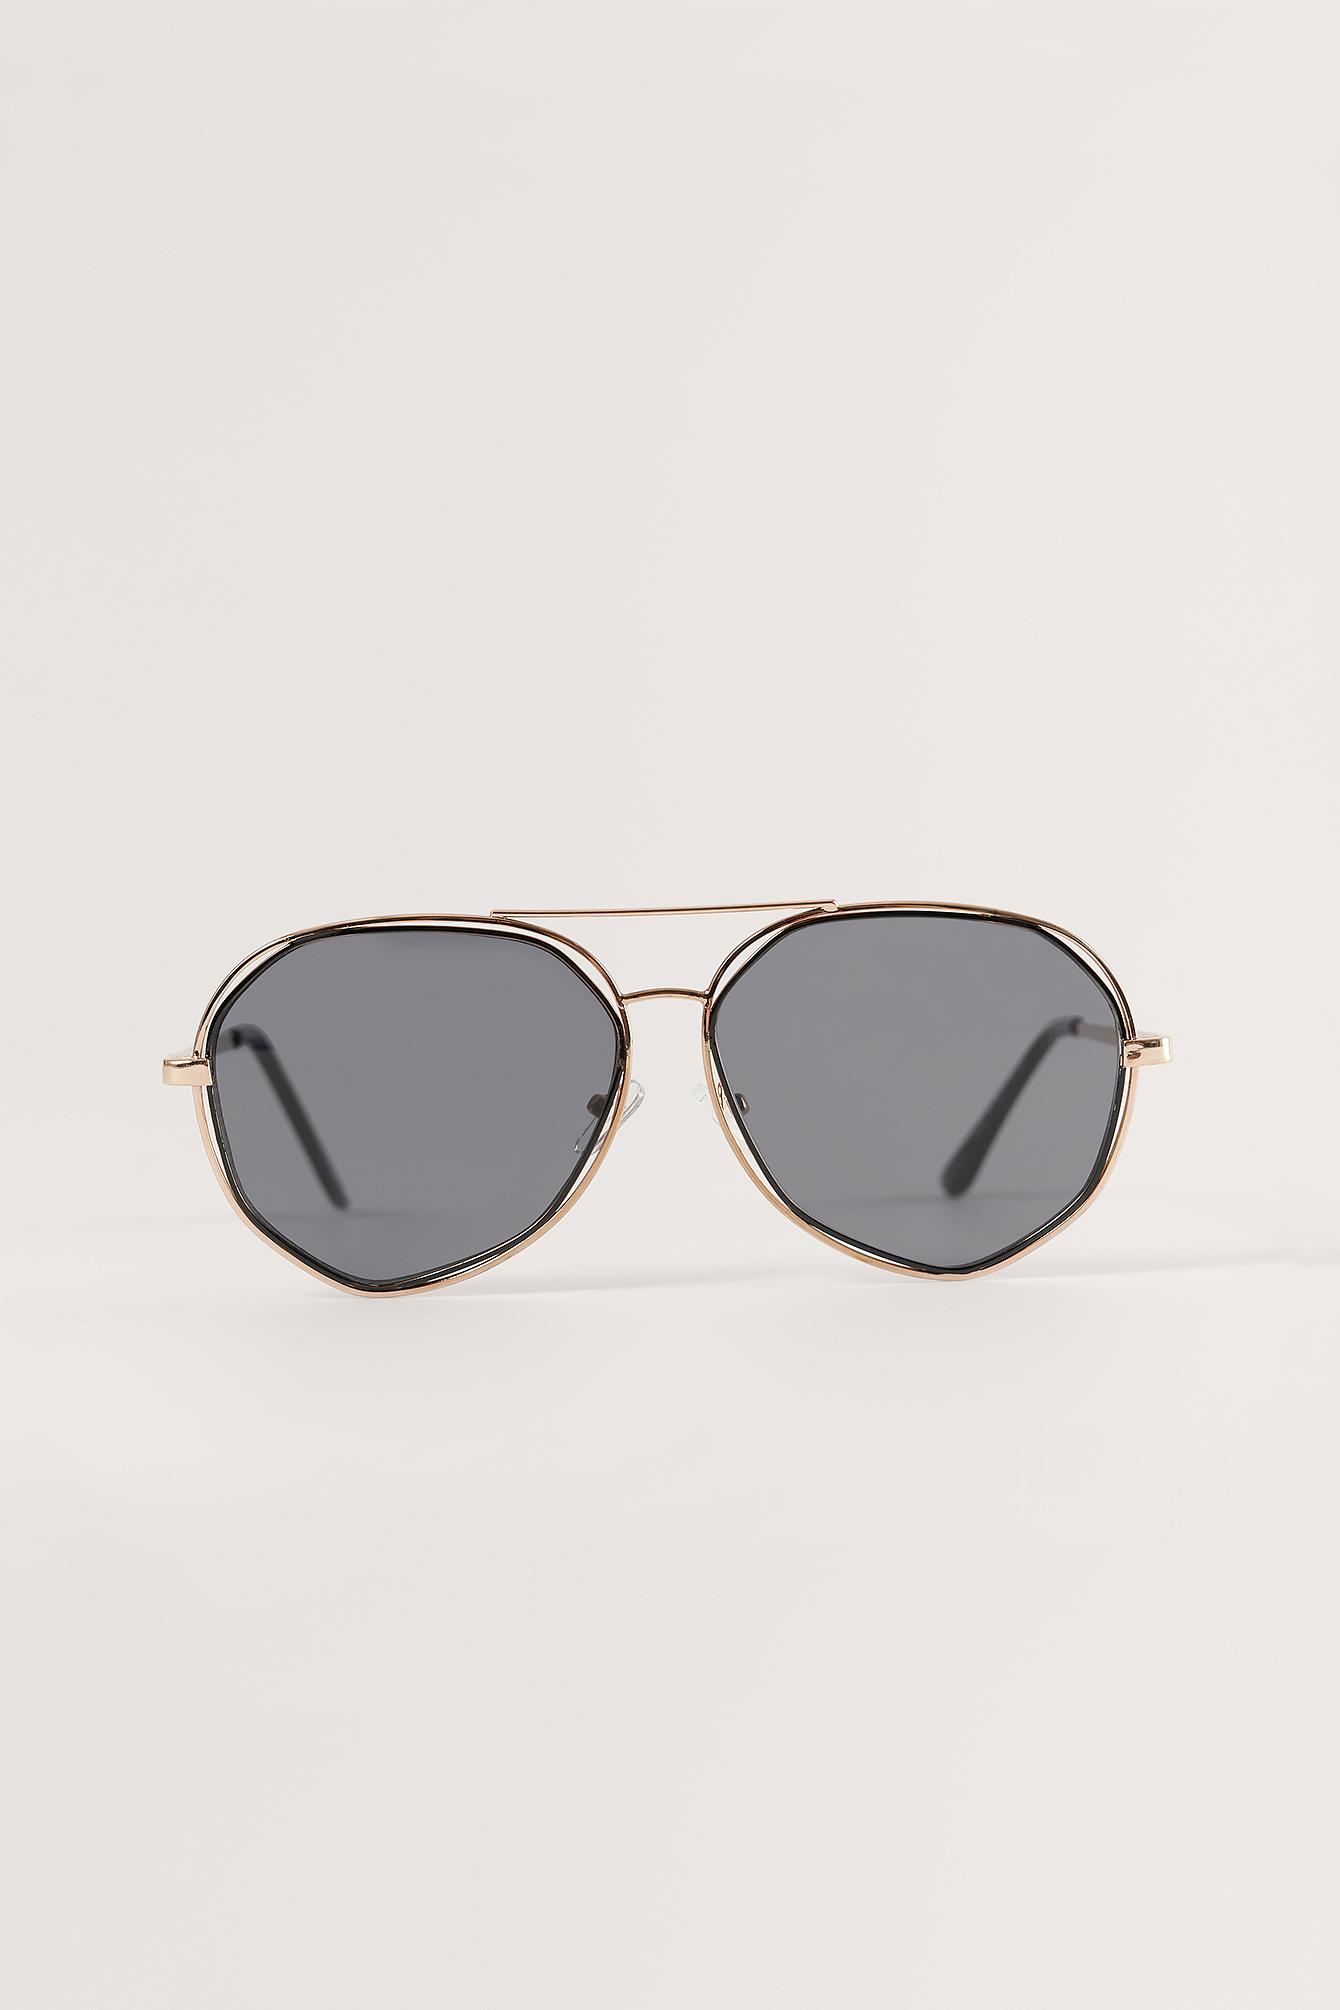 Na-kd Double Metal Pilot Sunglasses - Black